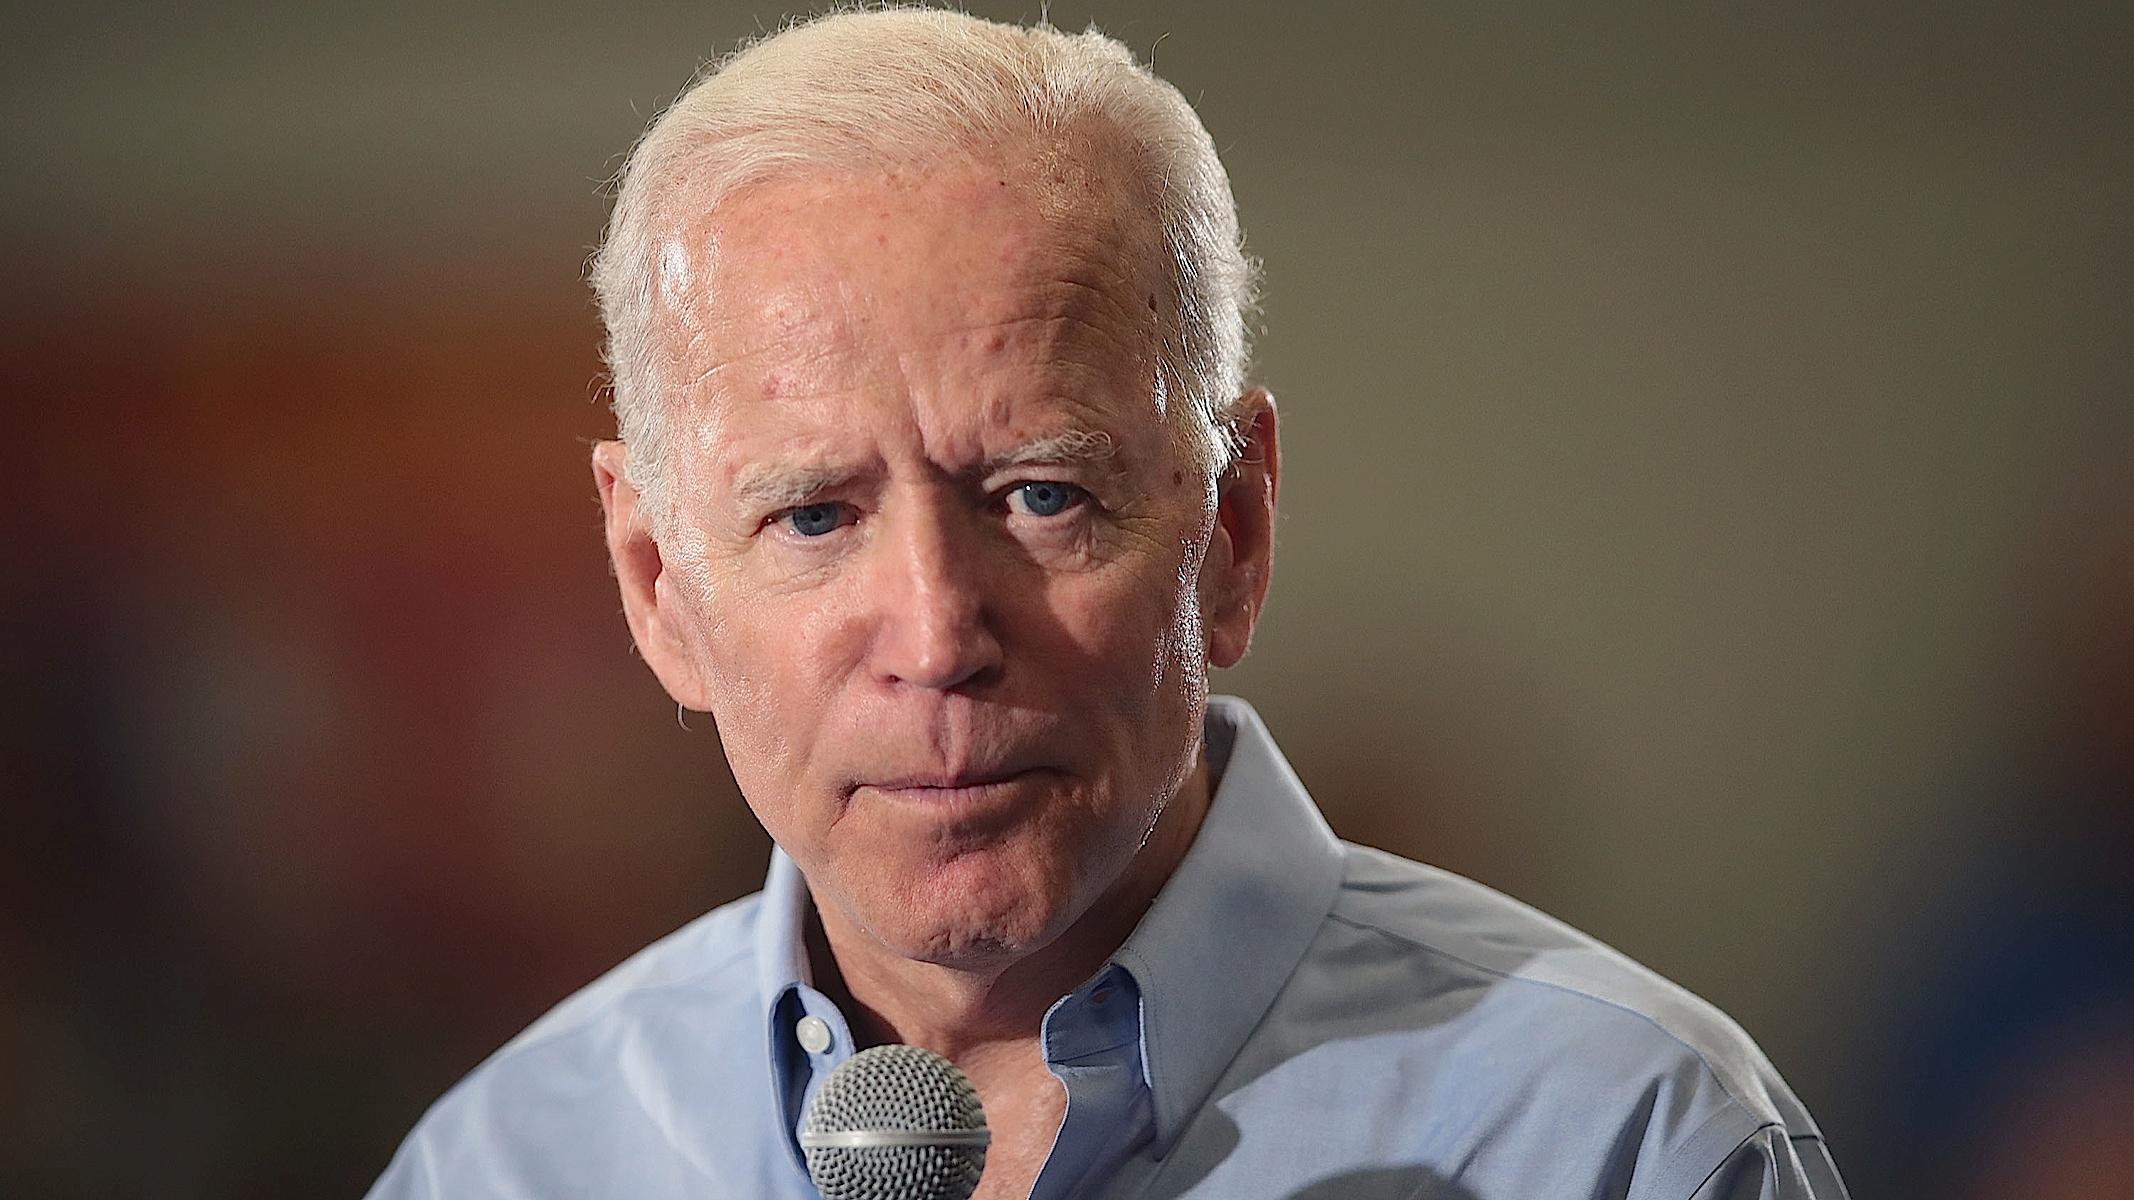 For Democrats, Joe Biden Is the Dangerous Choice That *Feels* Safe